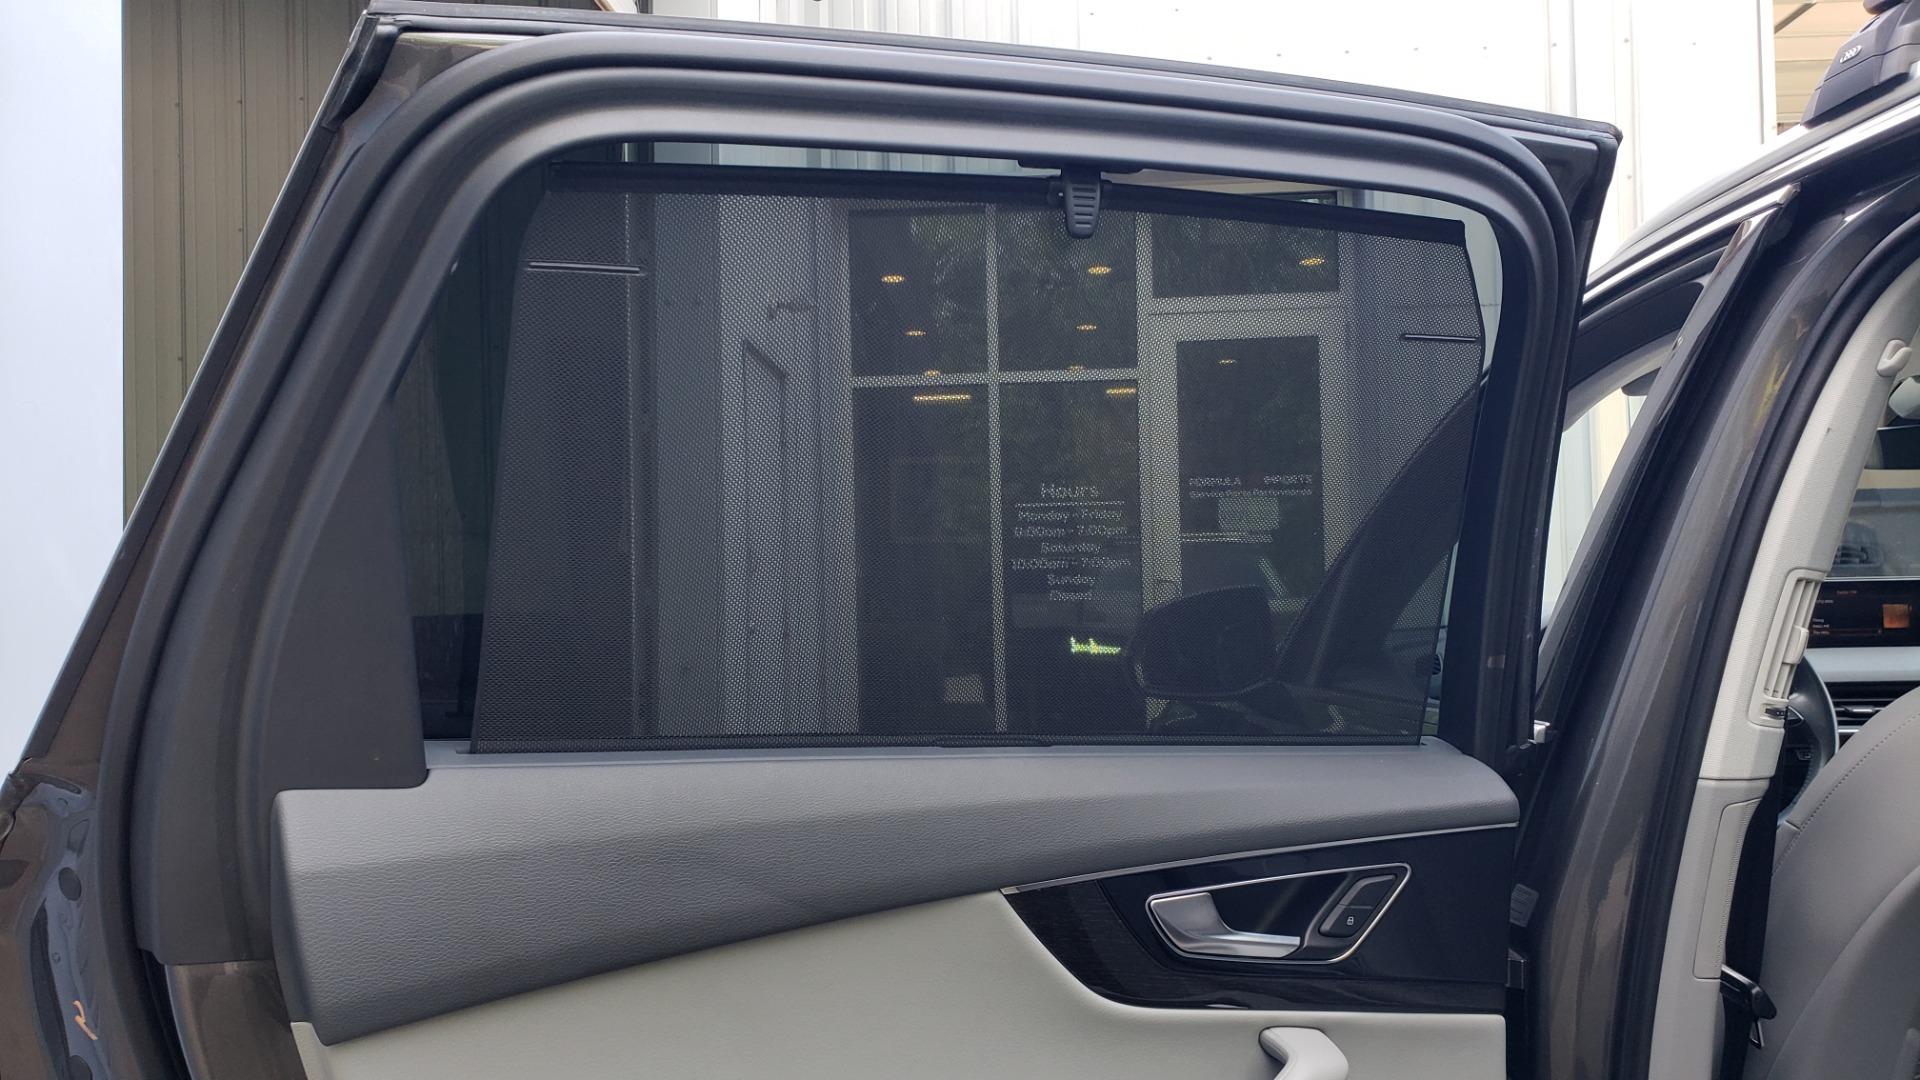 Used 2018 Audi Q7 PRESTIGE TIPTRONIC / NAV / SUNROOF / ADAPTIVE PKG / DRVR ASST / CLD WTHR /  for sale $49,995 at Formula Imports in Charlotte NC 28227 59